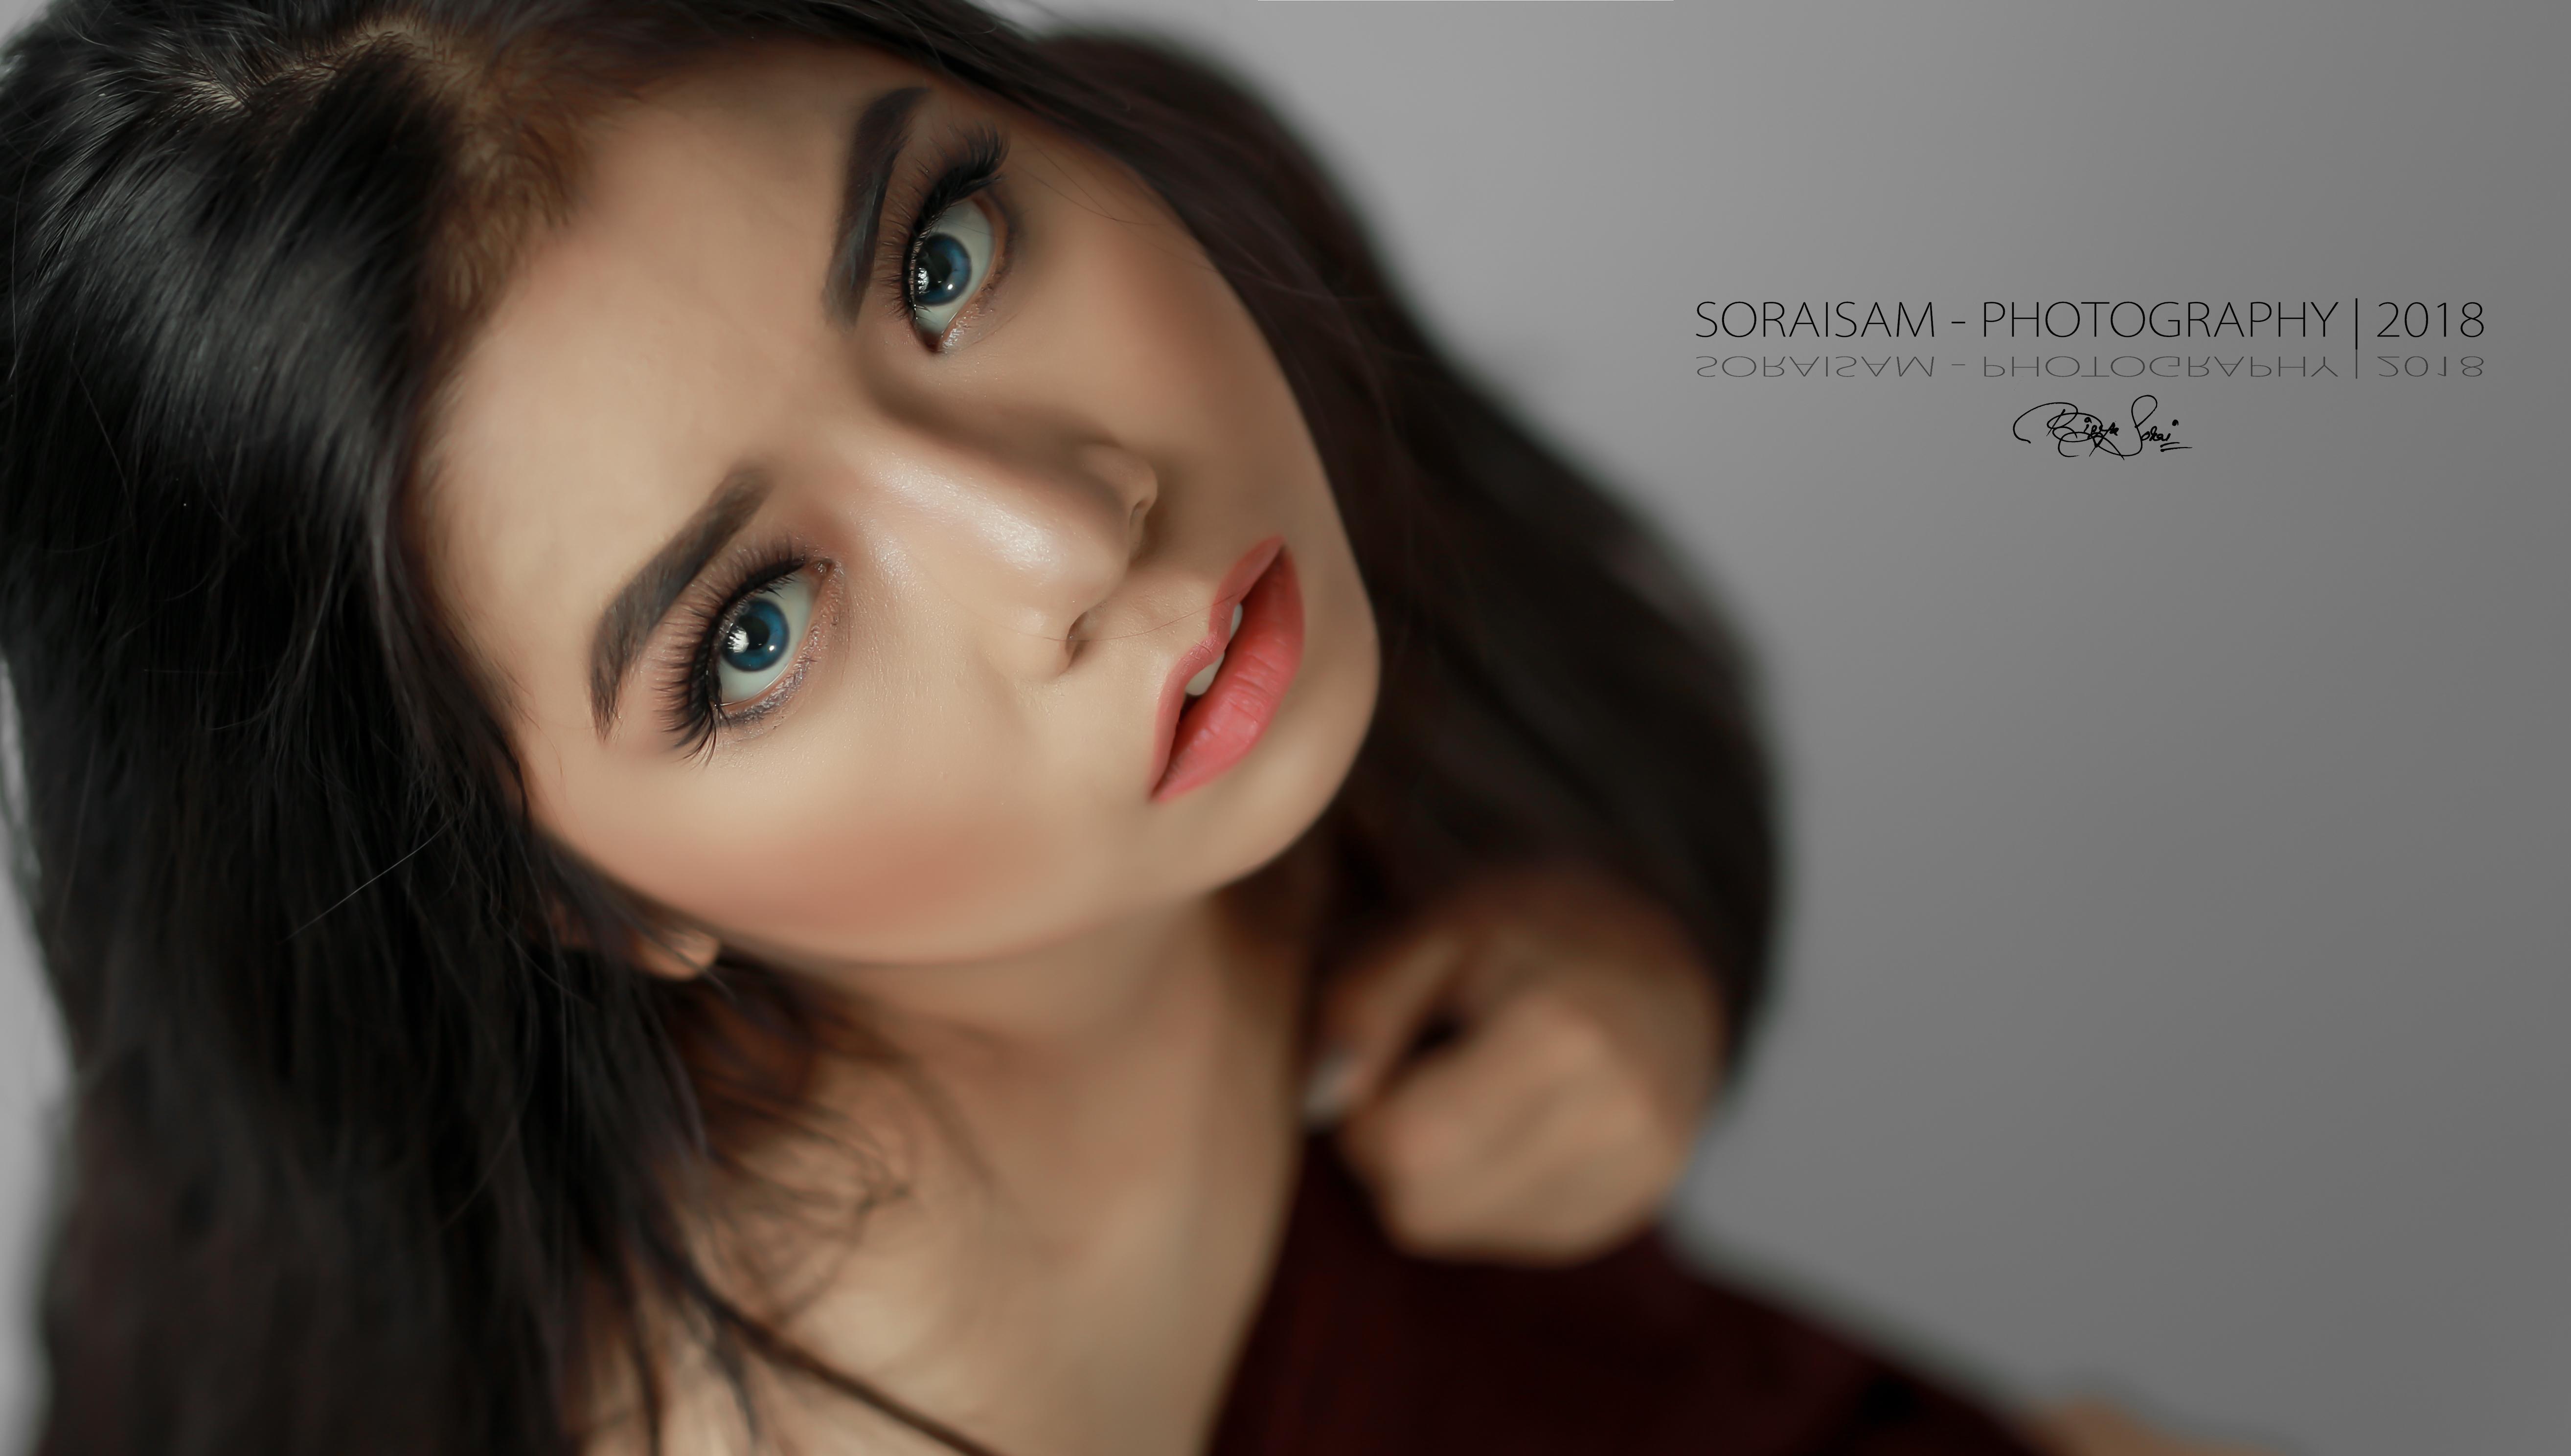 soraisam photography